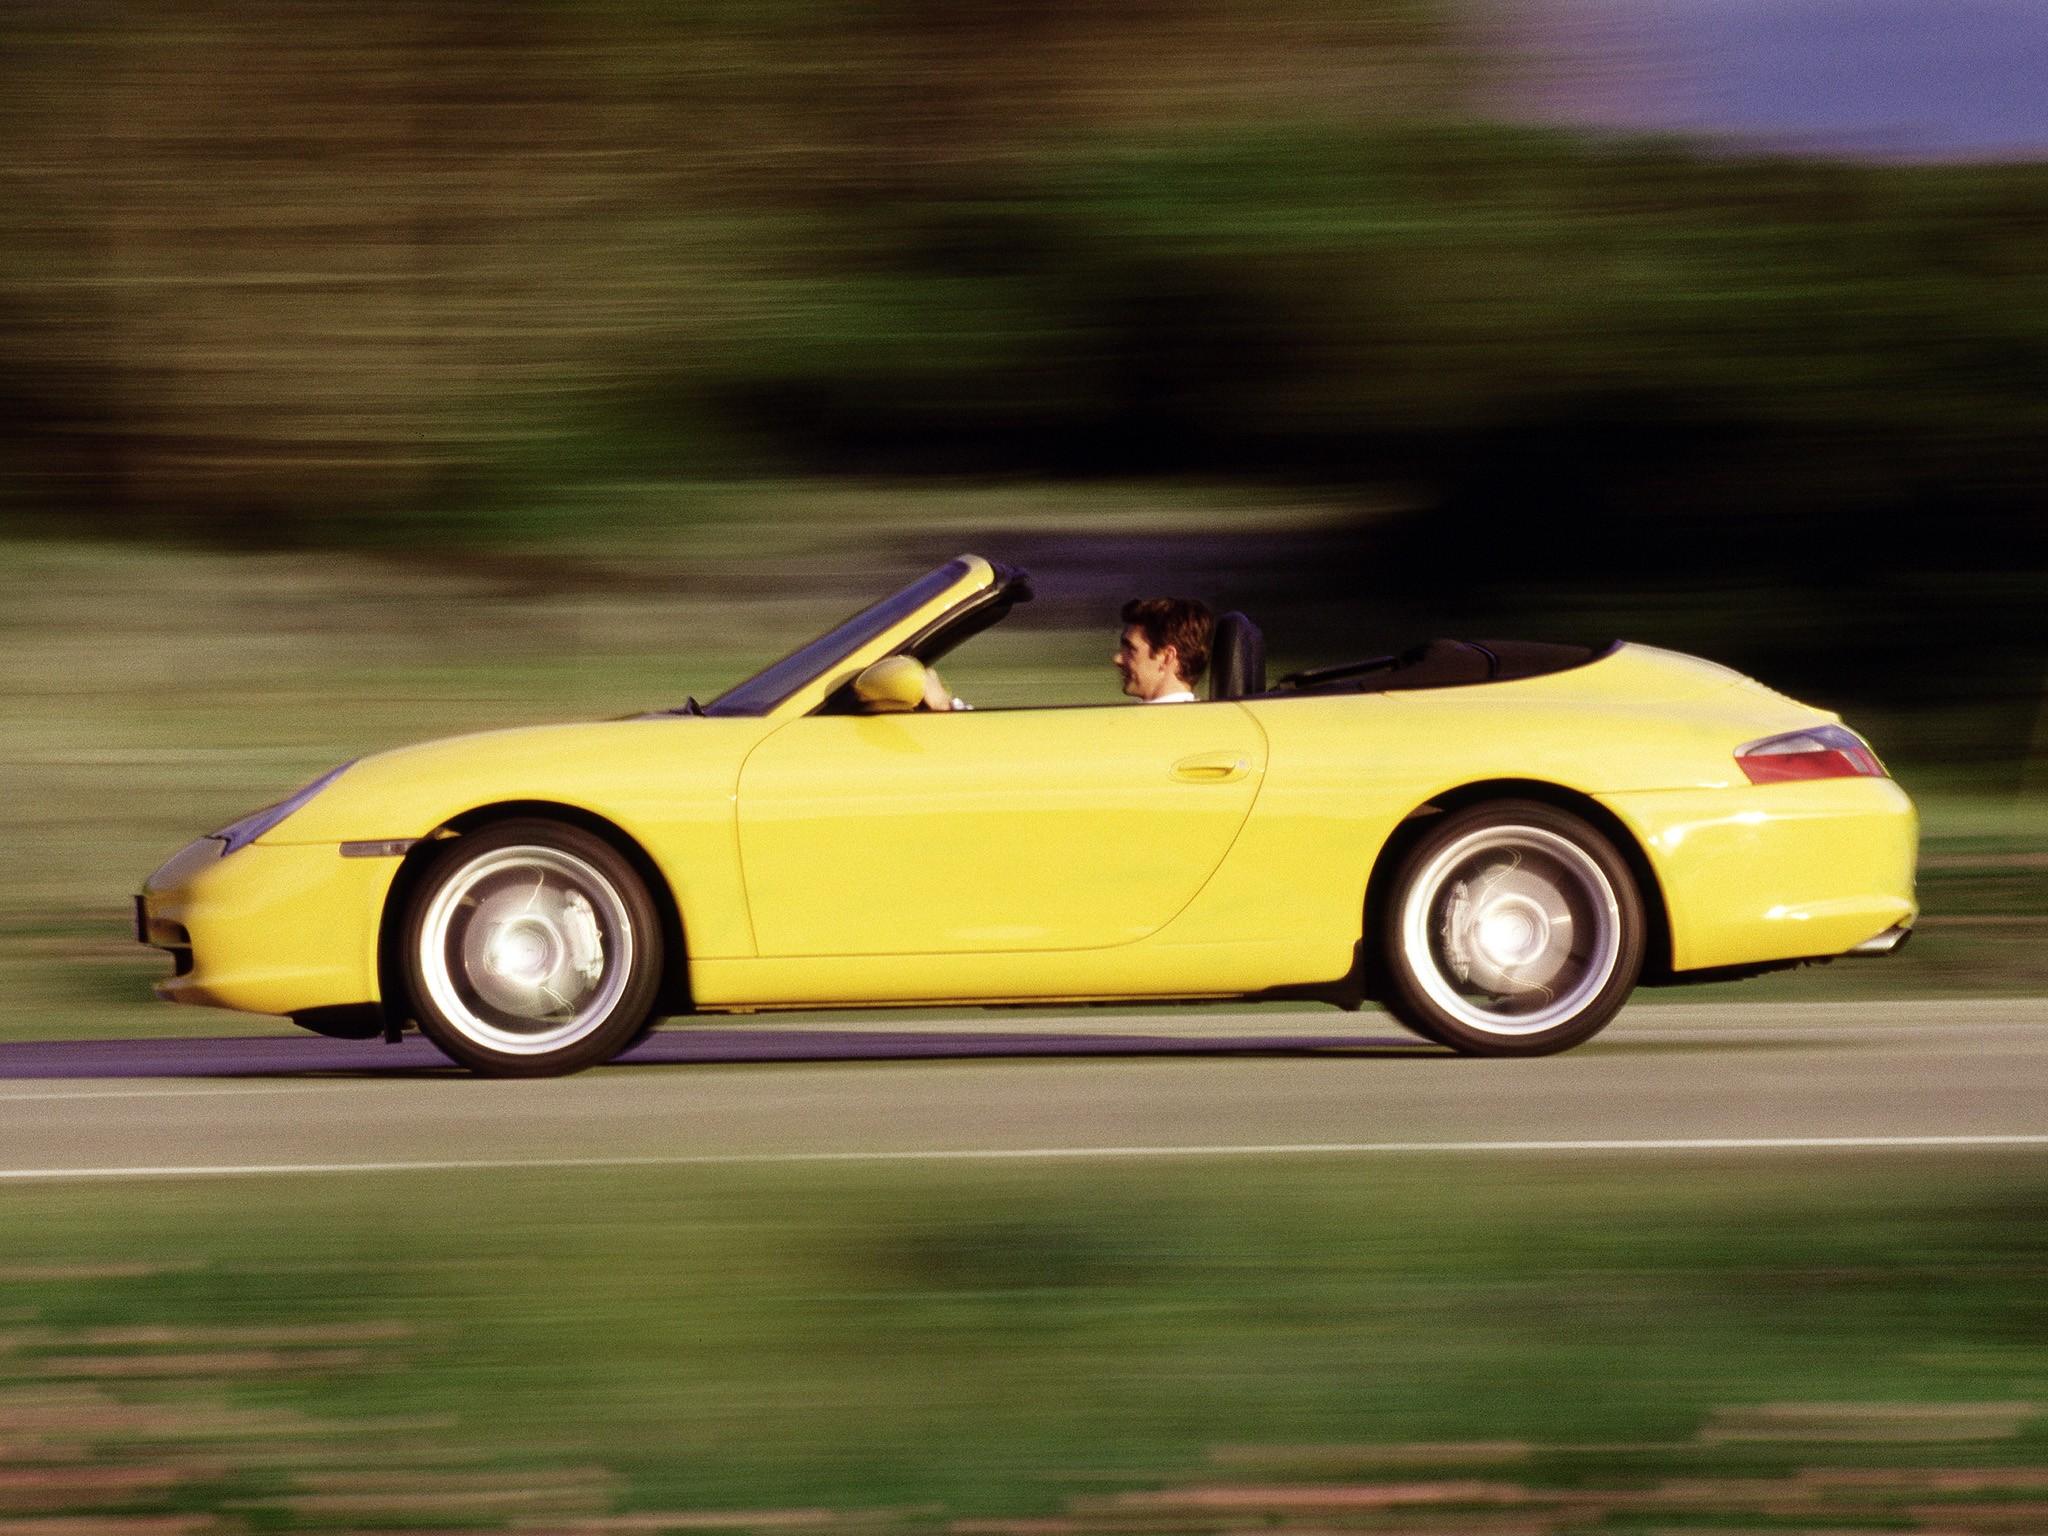 PORSCHE 911 Carrera 4 Cabriolet 996  2001, 2002, 2003, 2004